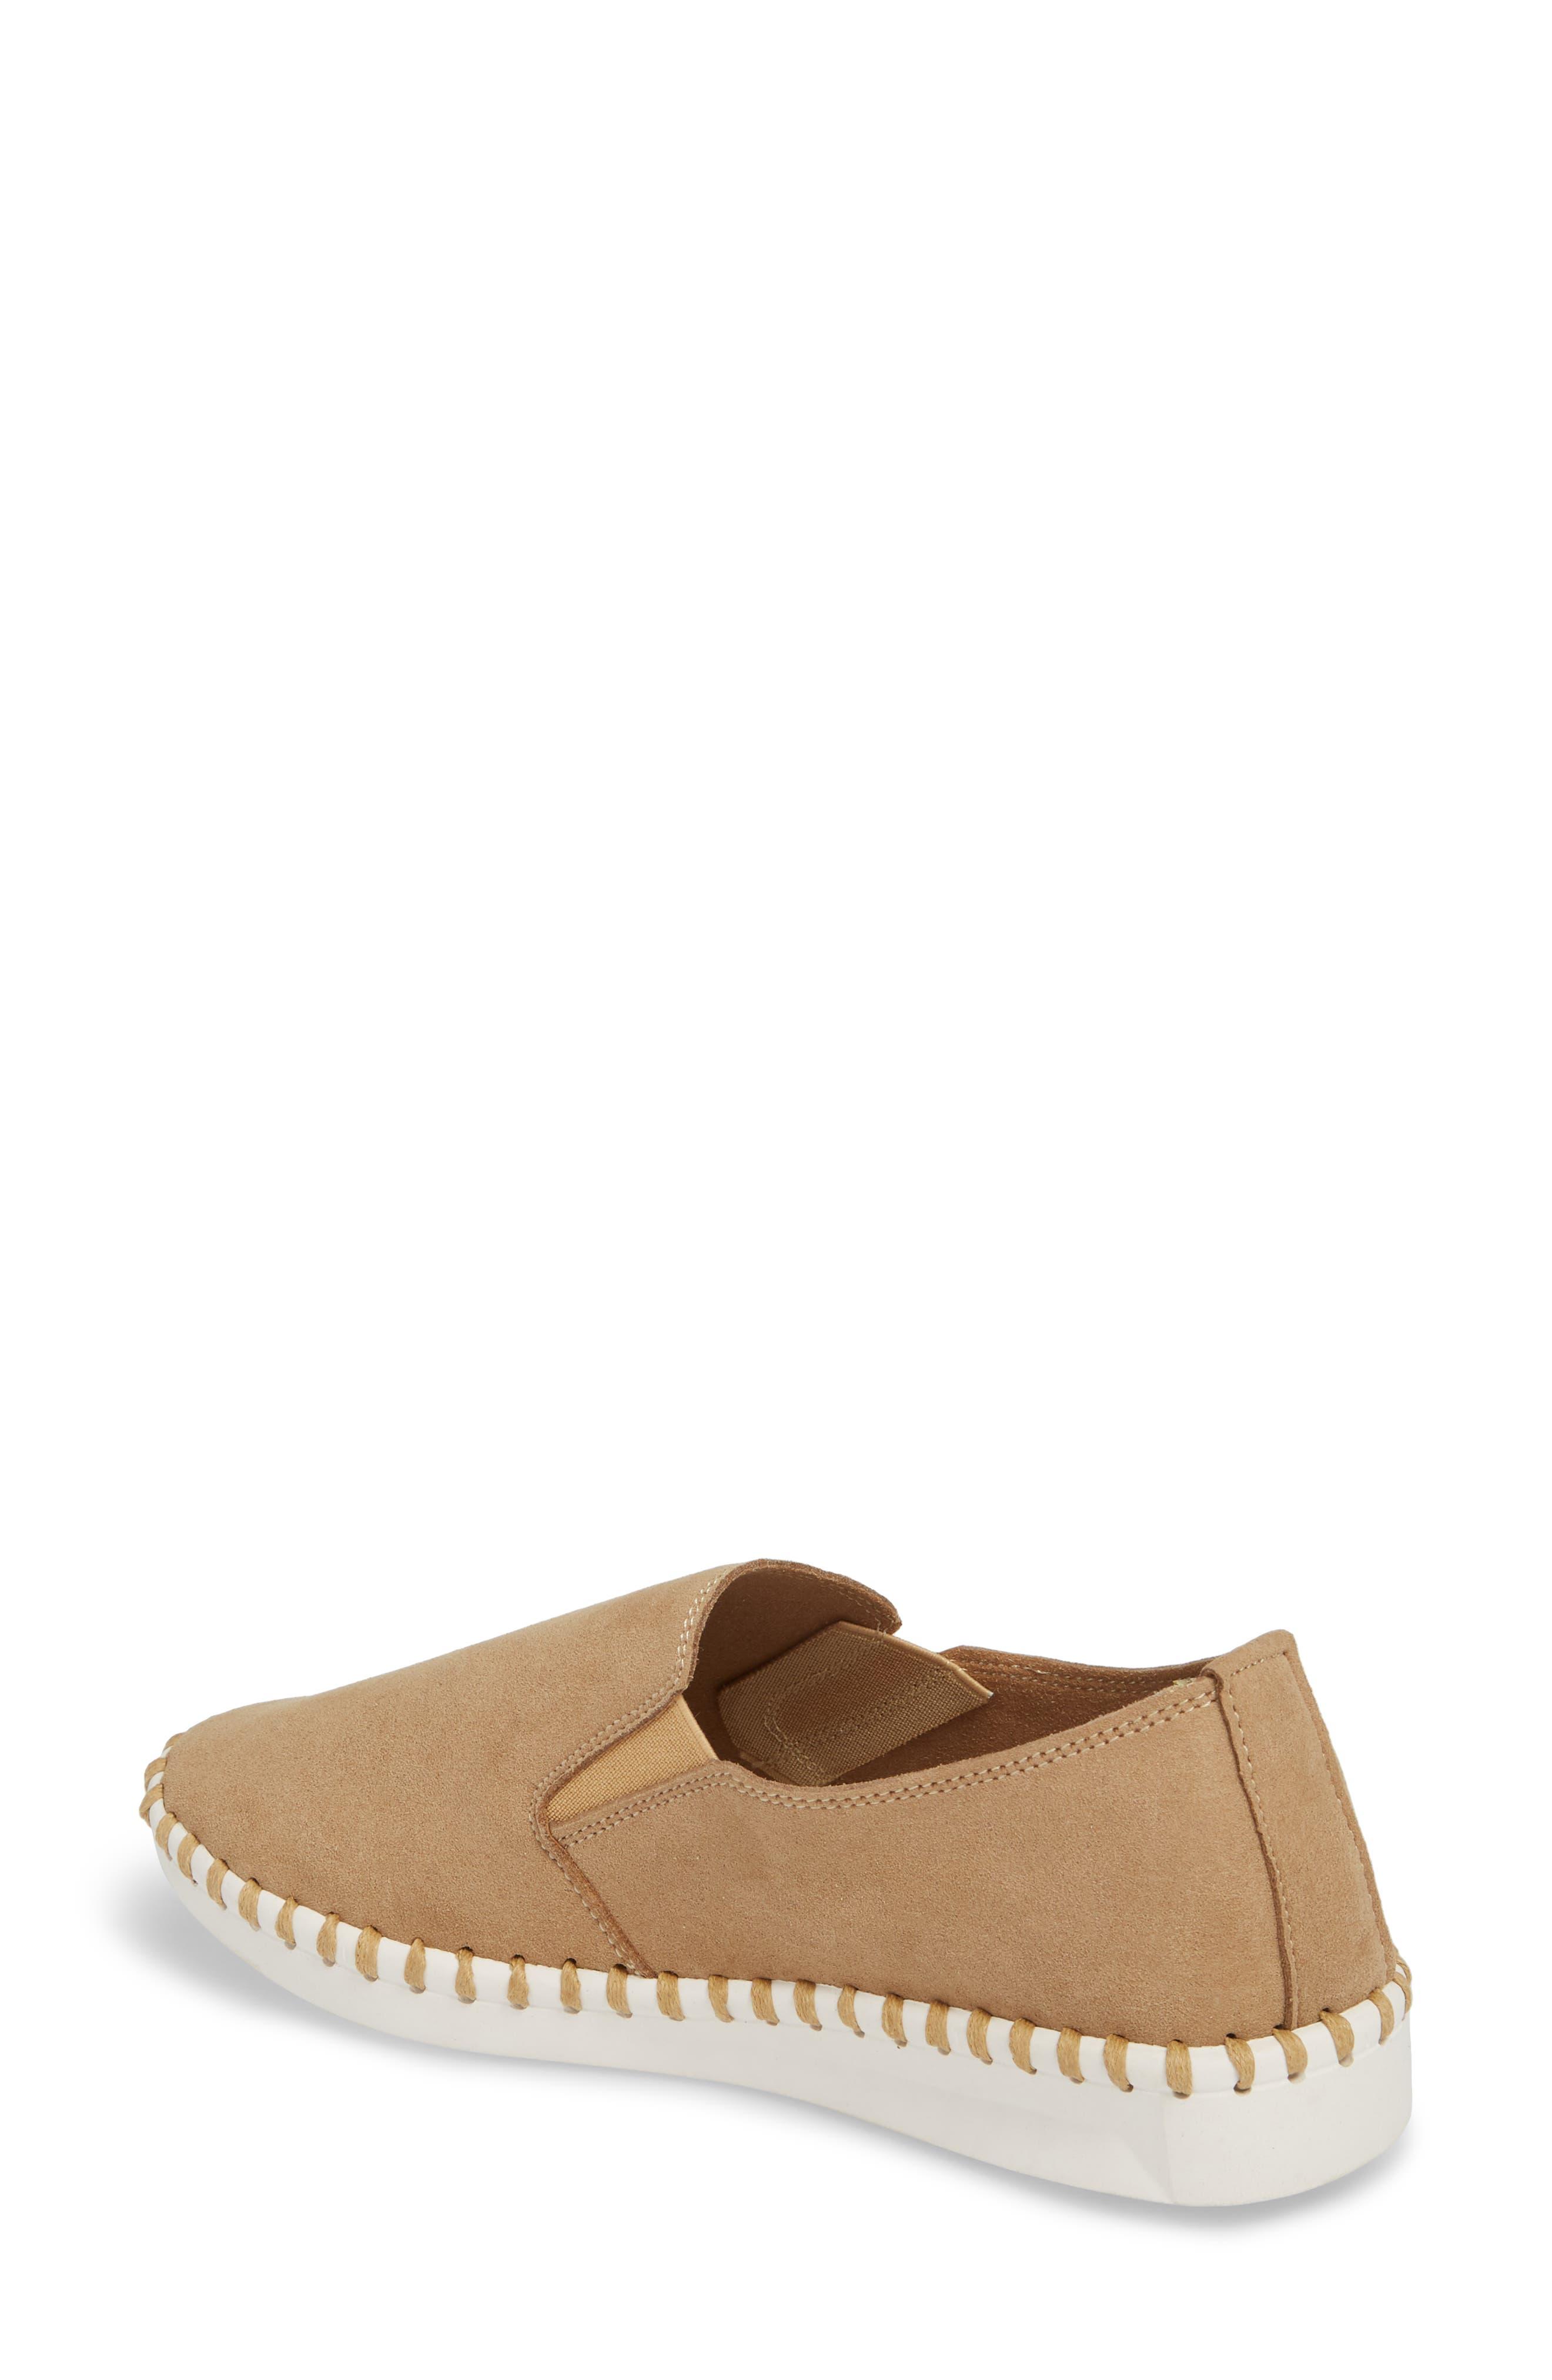 Salinas Waterproof Slip-On Sneaker,                             Alternate thumbnail 2, color,                             Tan Fabric